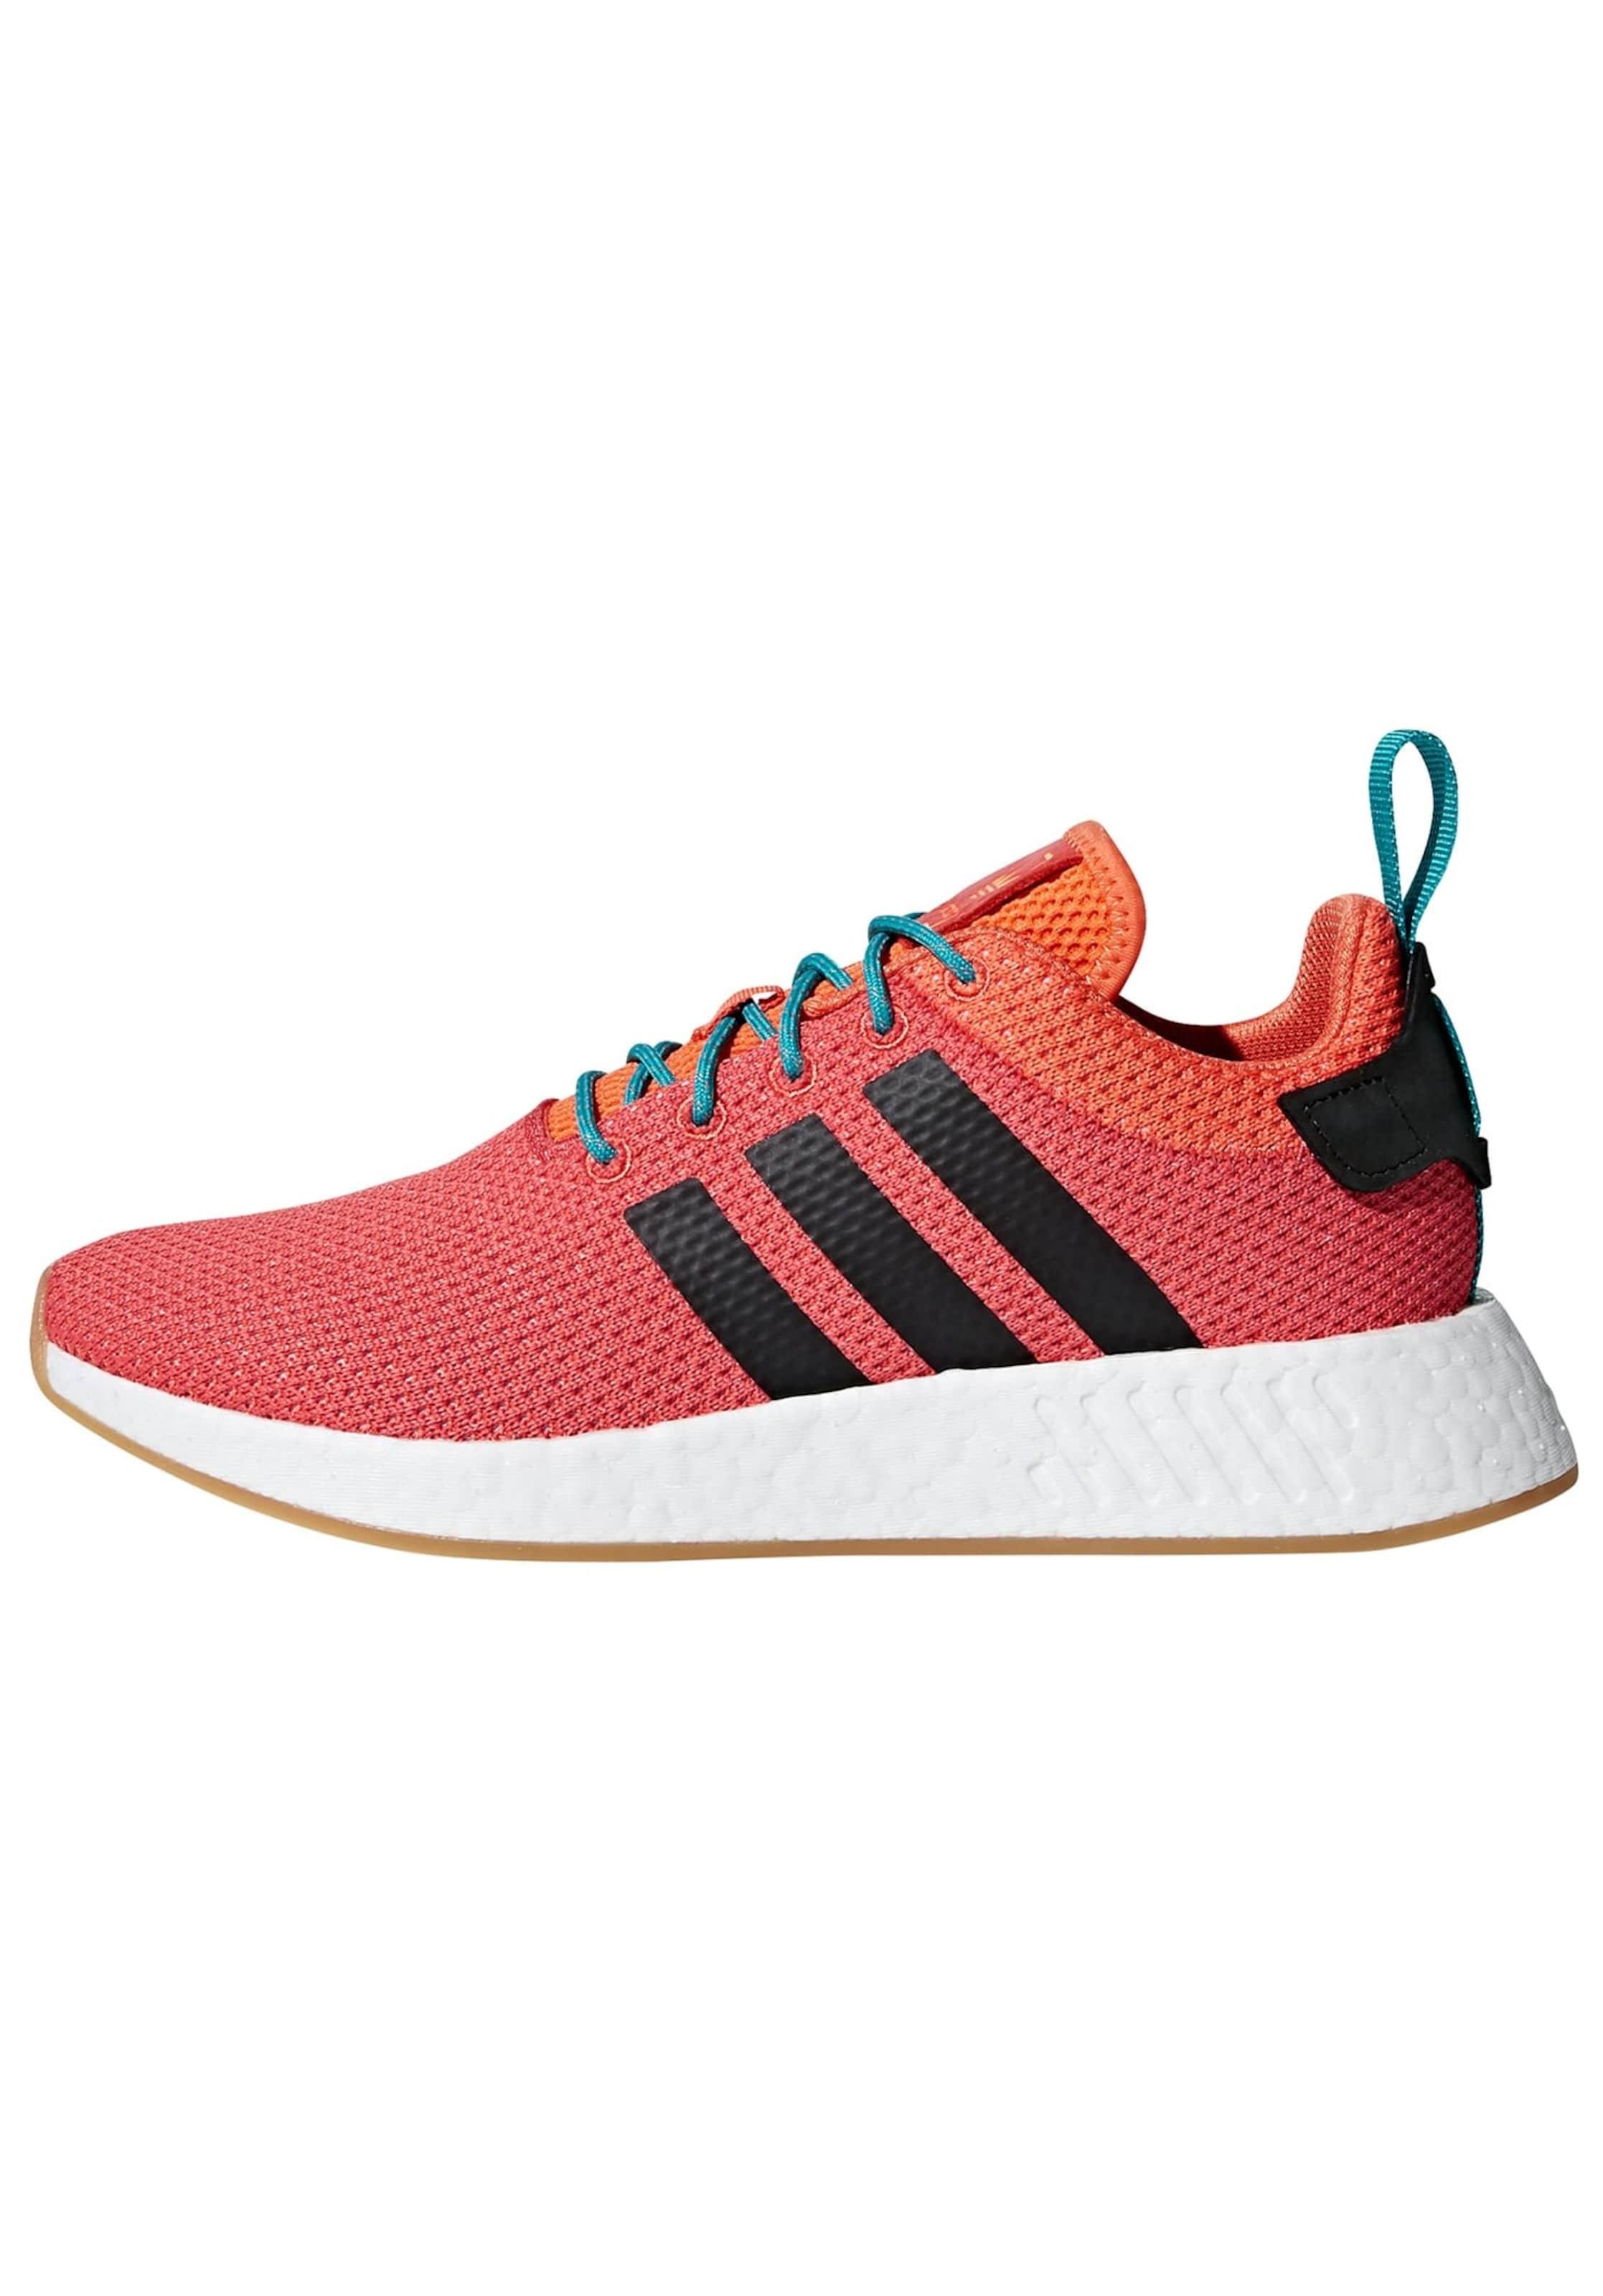 ADIDAS ORIGINALS Sneaker  Nmd_R2 Summer